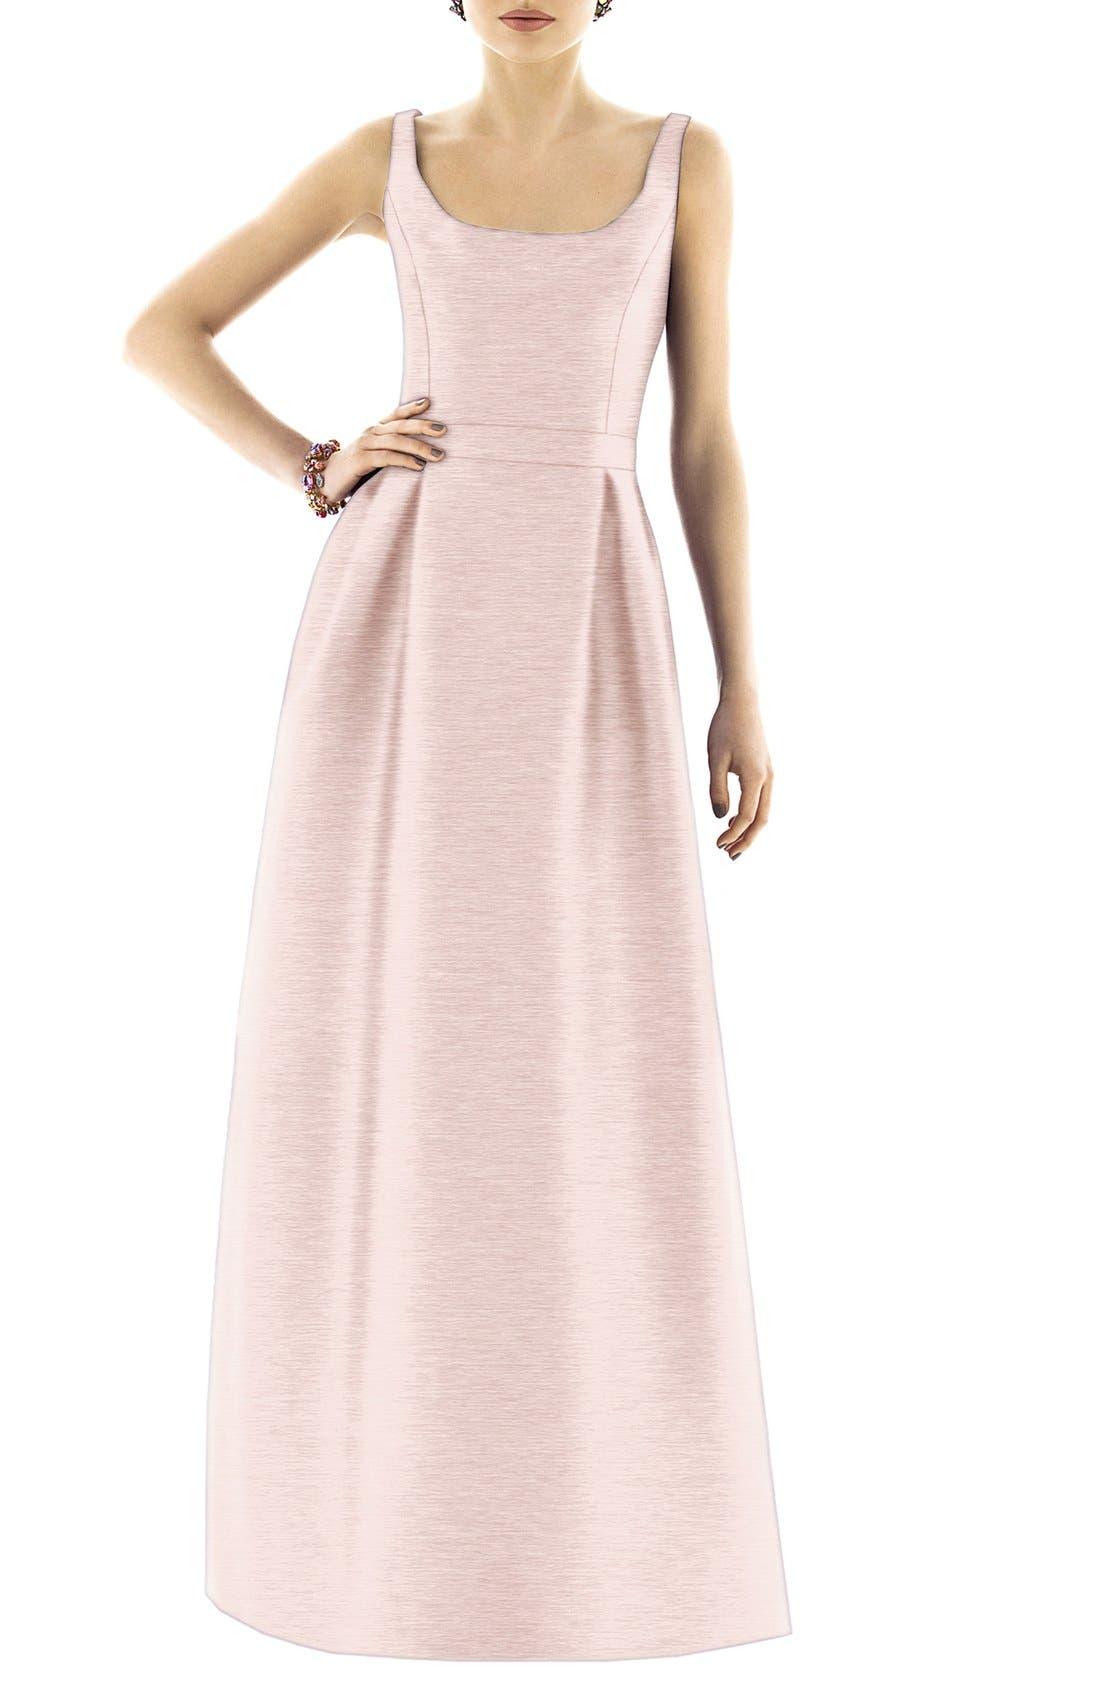 Scoop Neck Dupioni Full Length Dress,                             Alternate thumbnail 15, color,